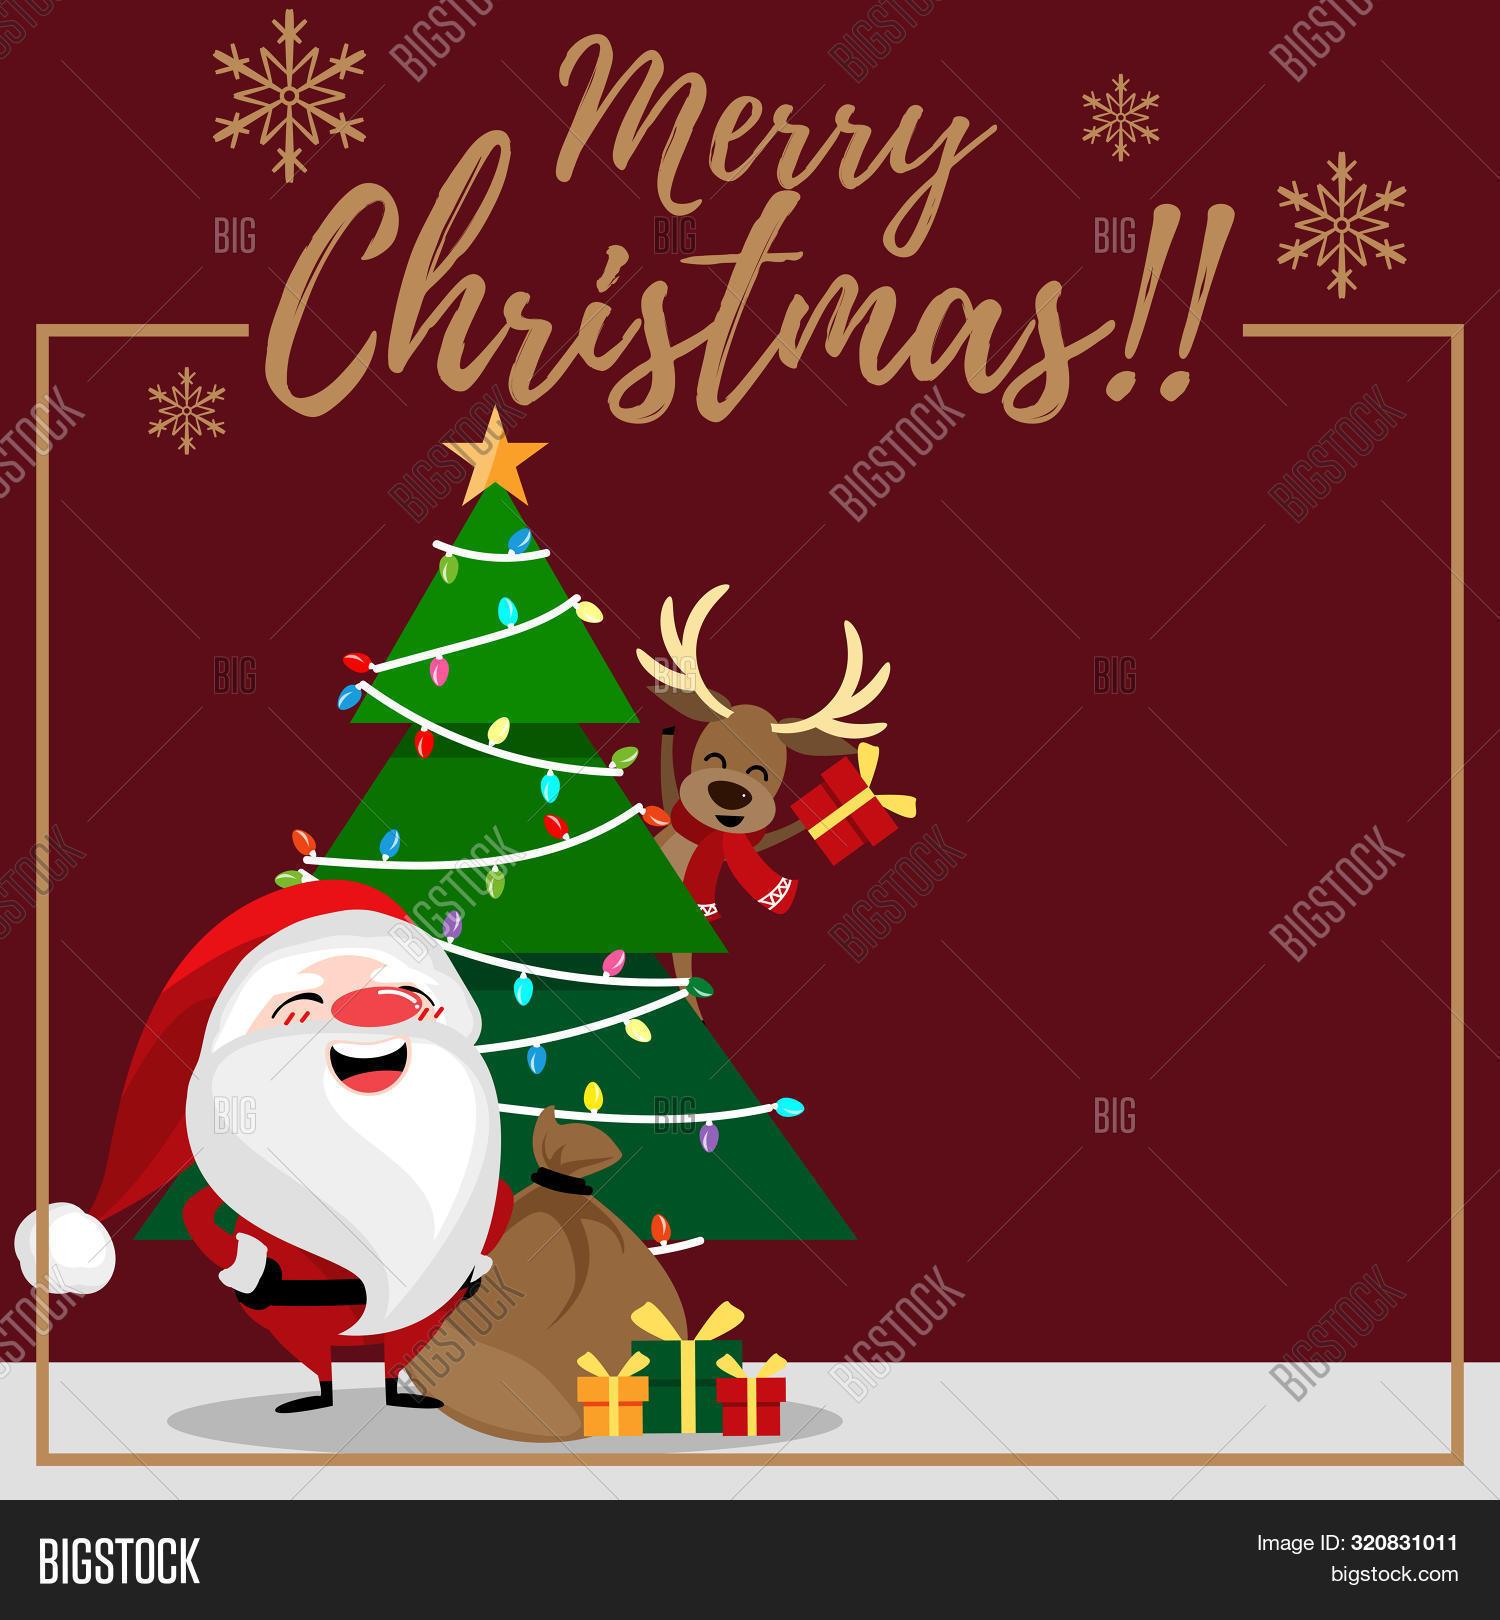 Christmas Cartoon Vector Photo Free Trial Bigstock